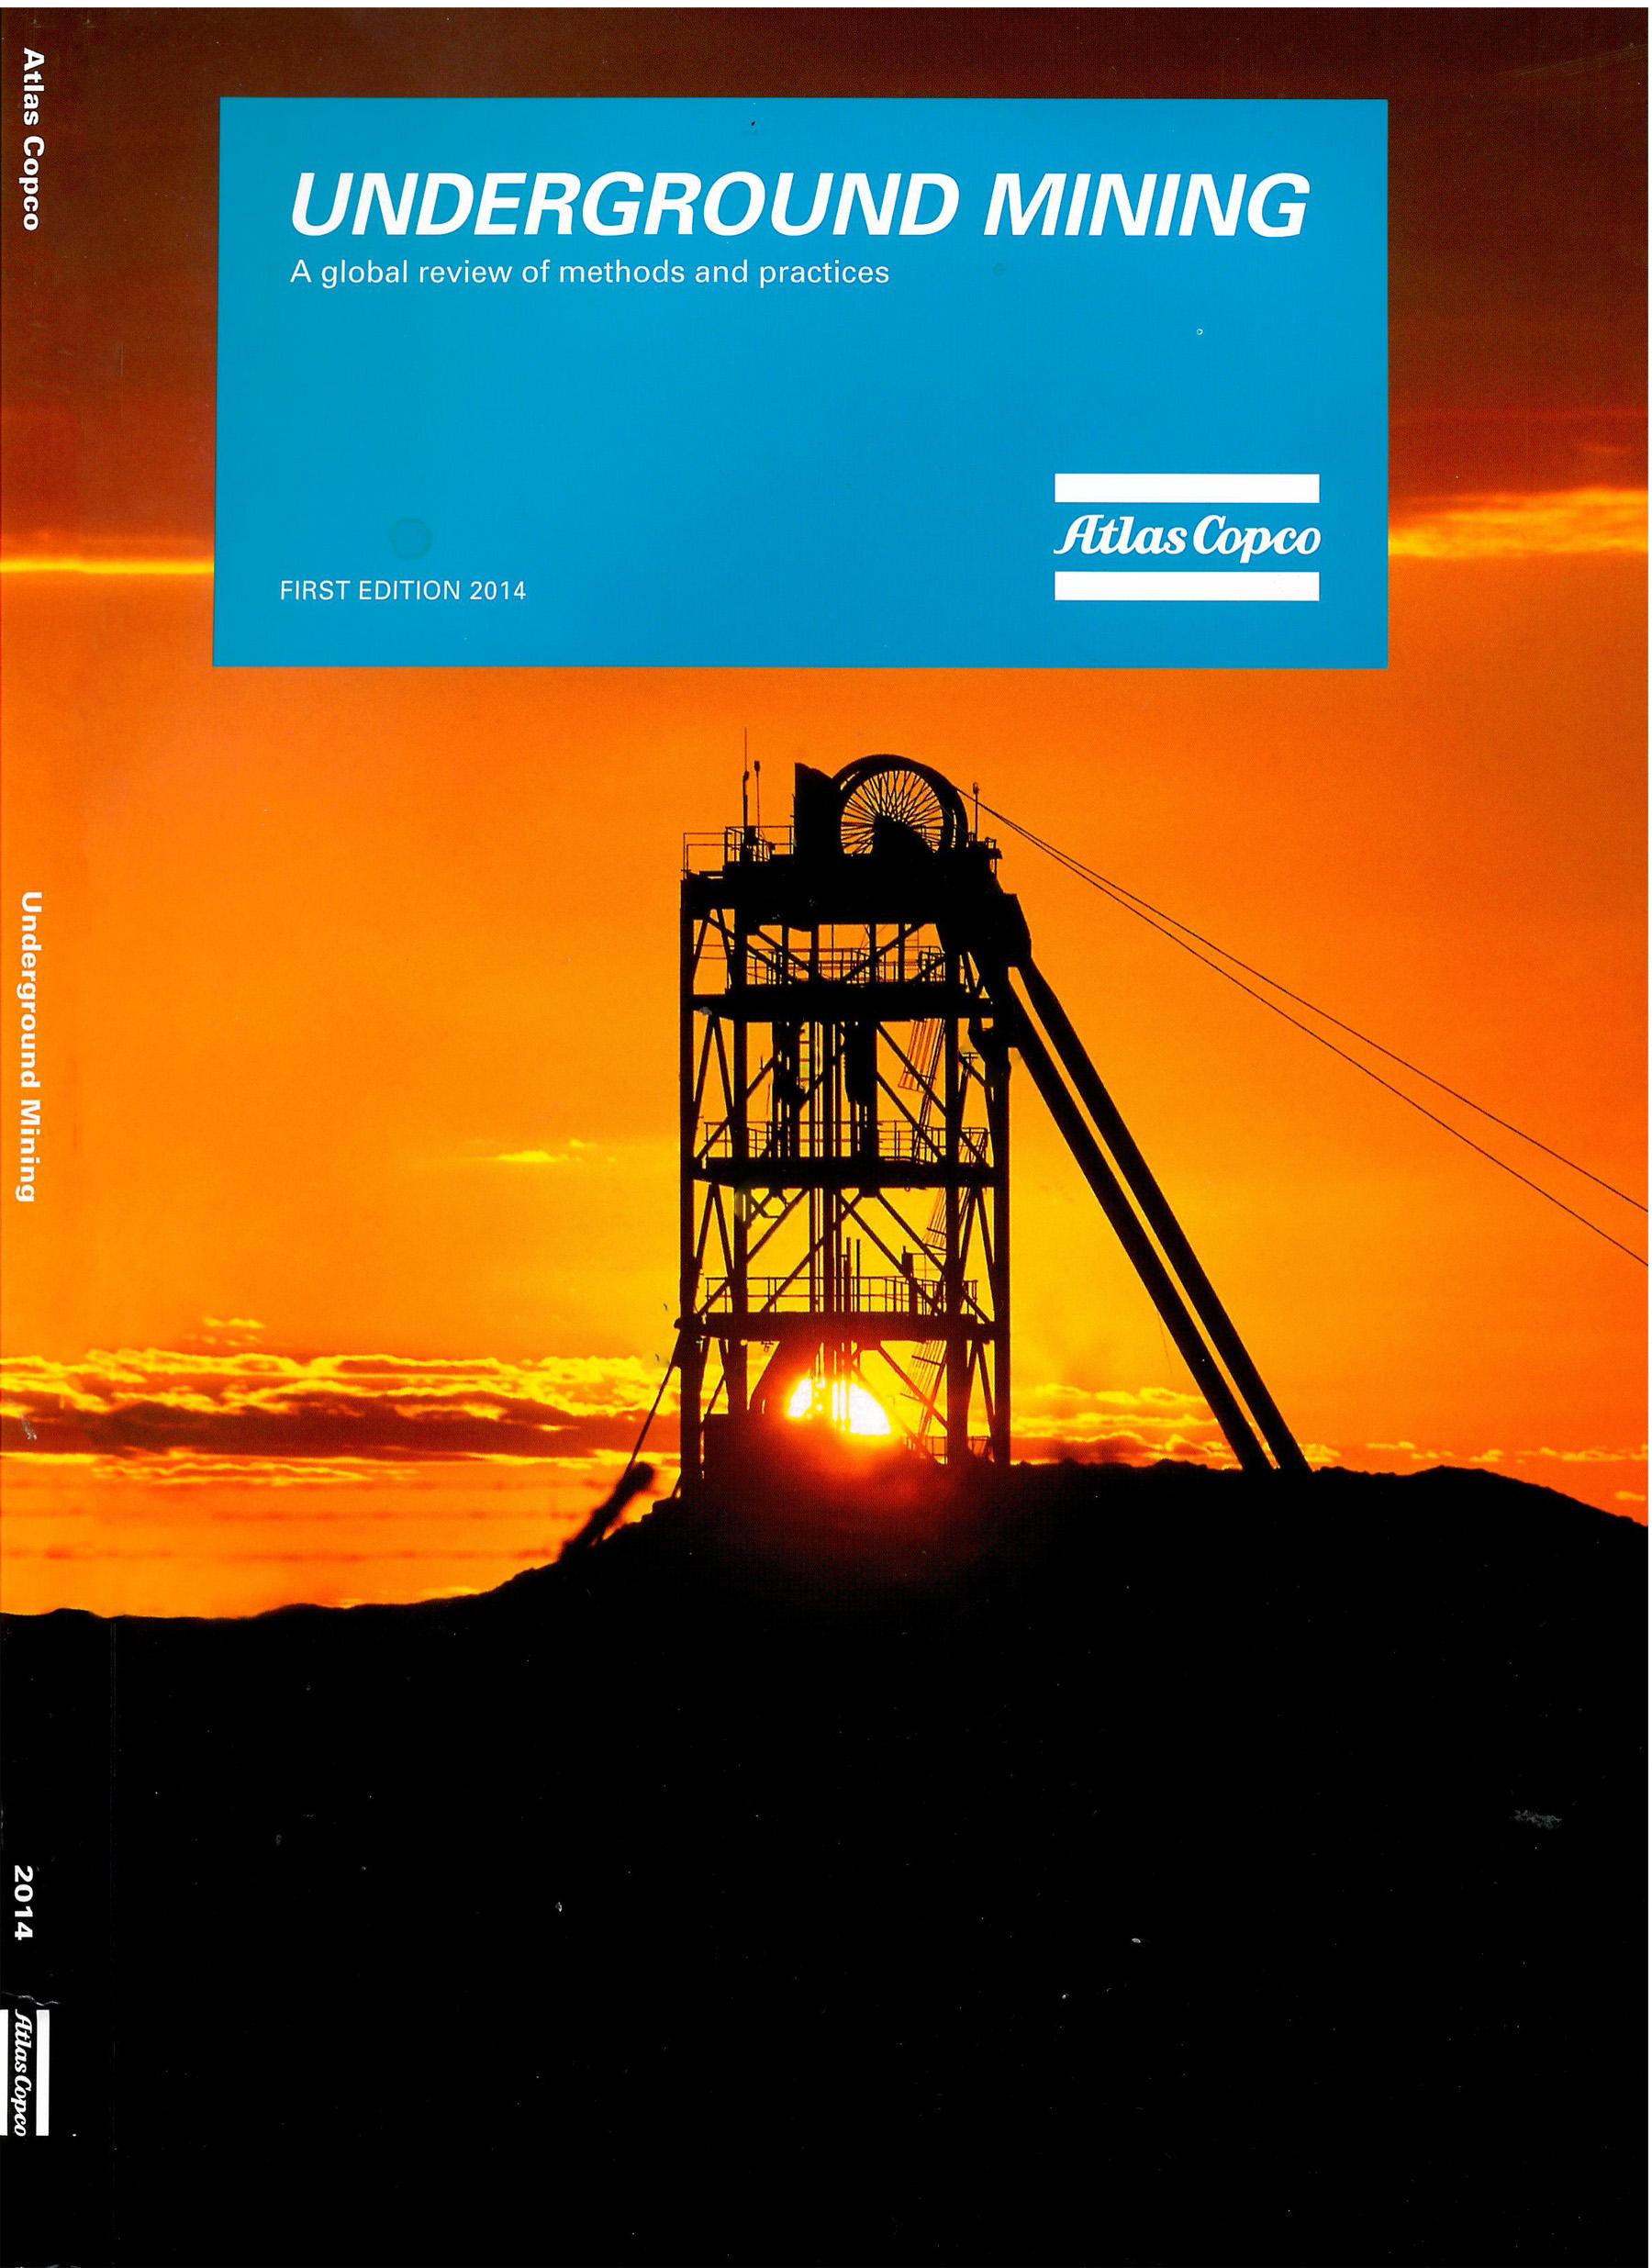 miningbook.jpg